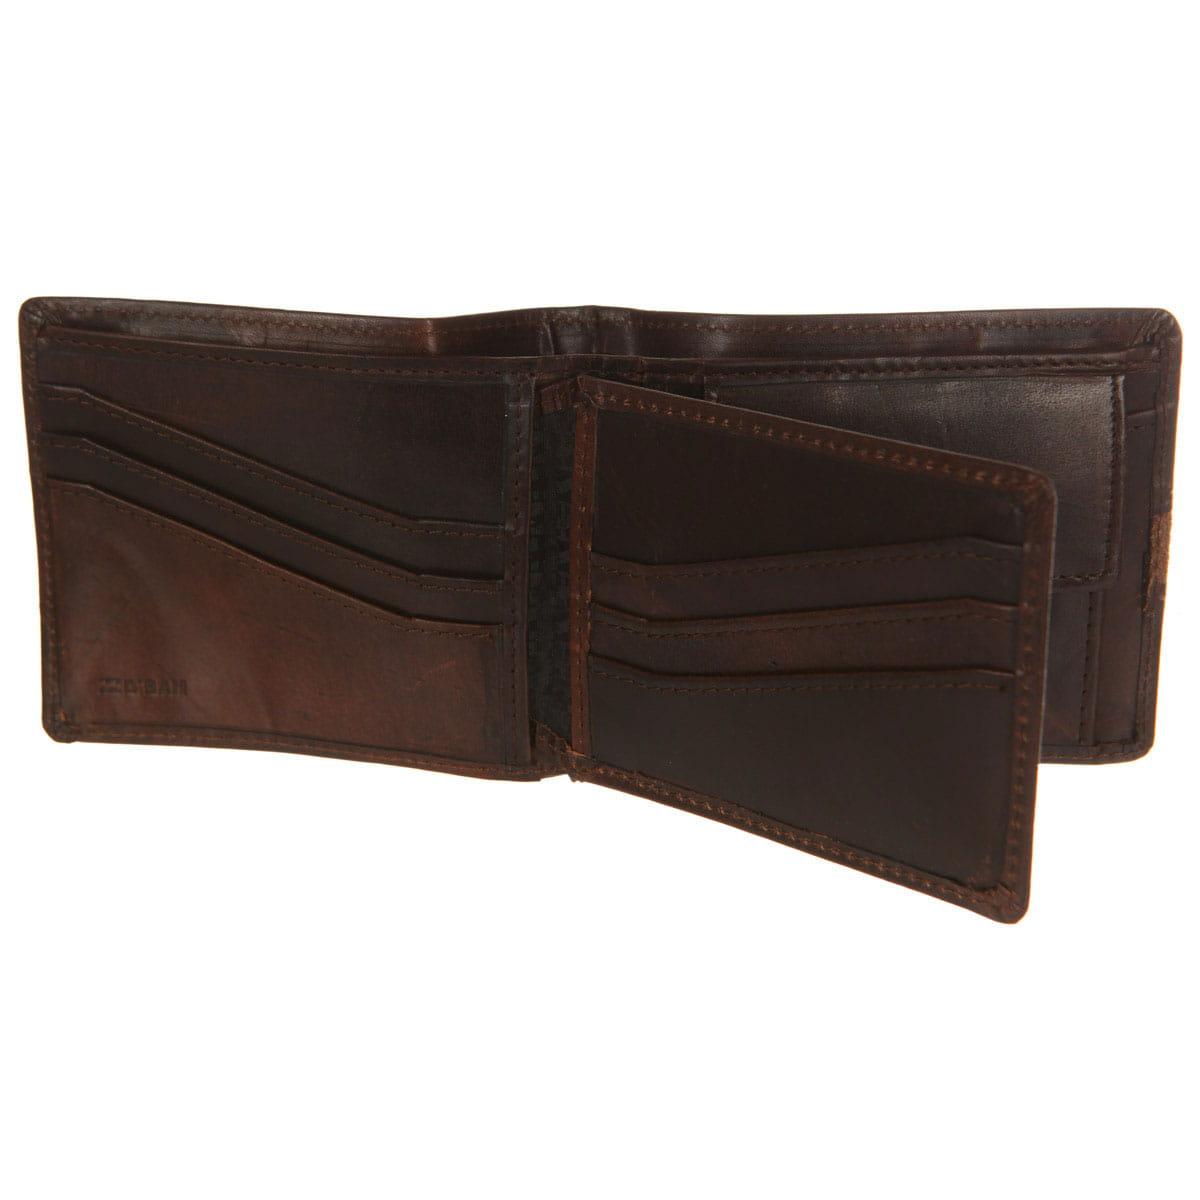 Мужской кошелек Billabong Dbah Leather Chocolate